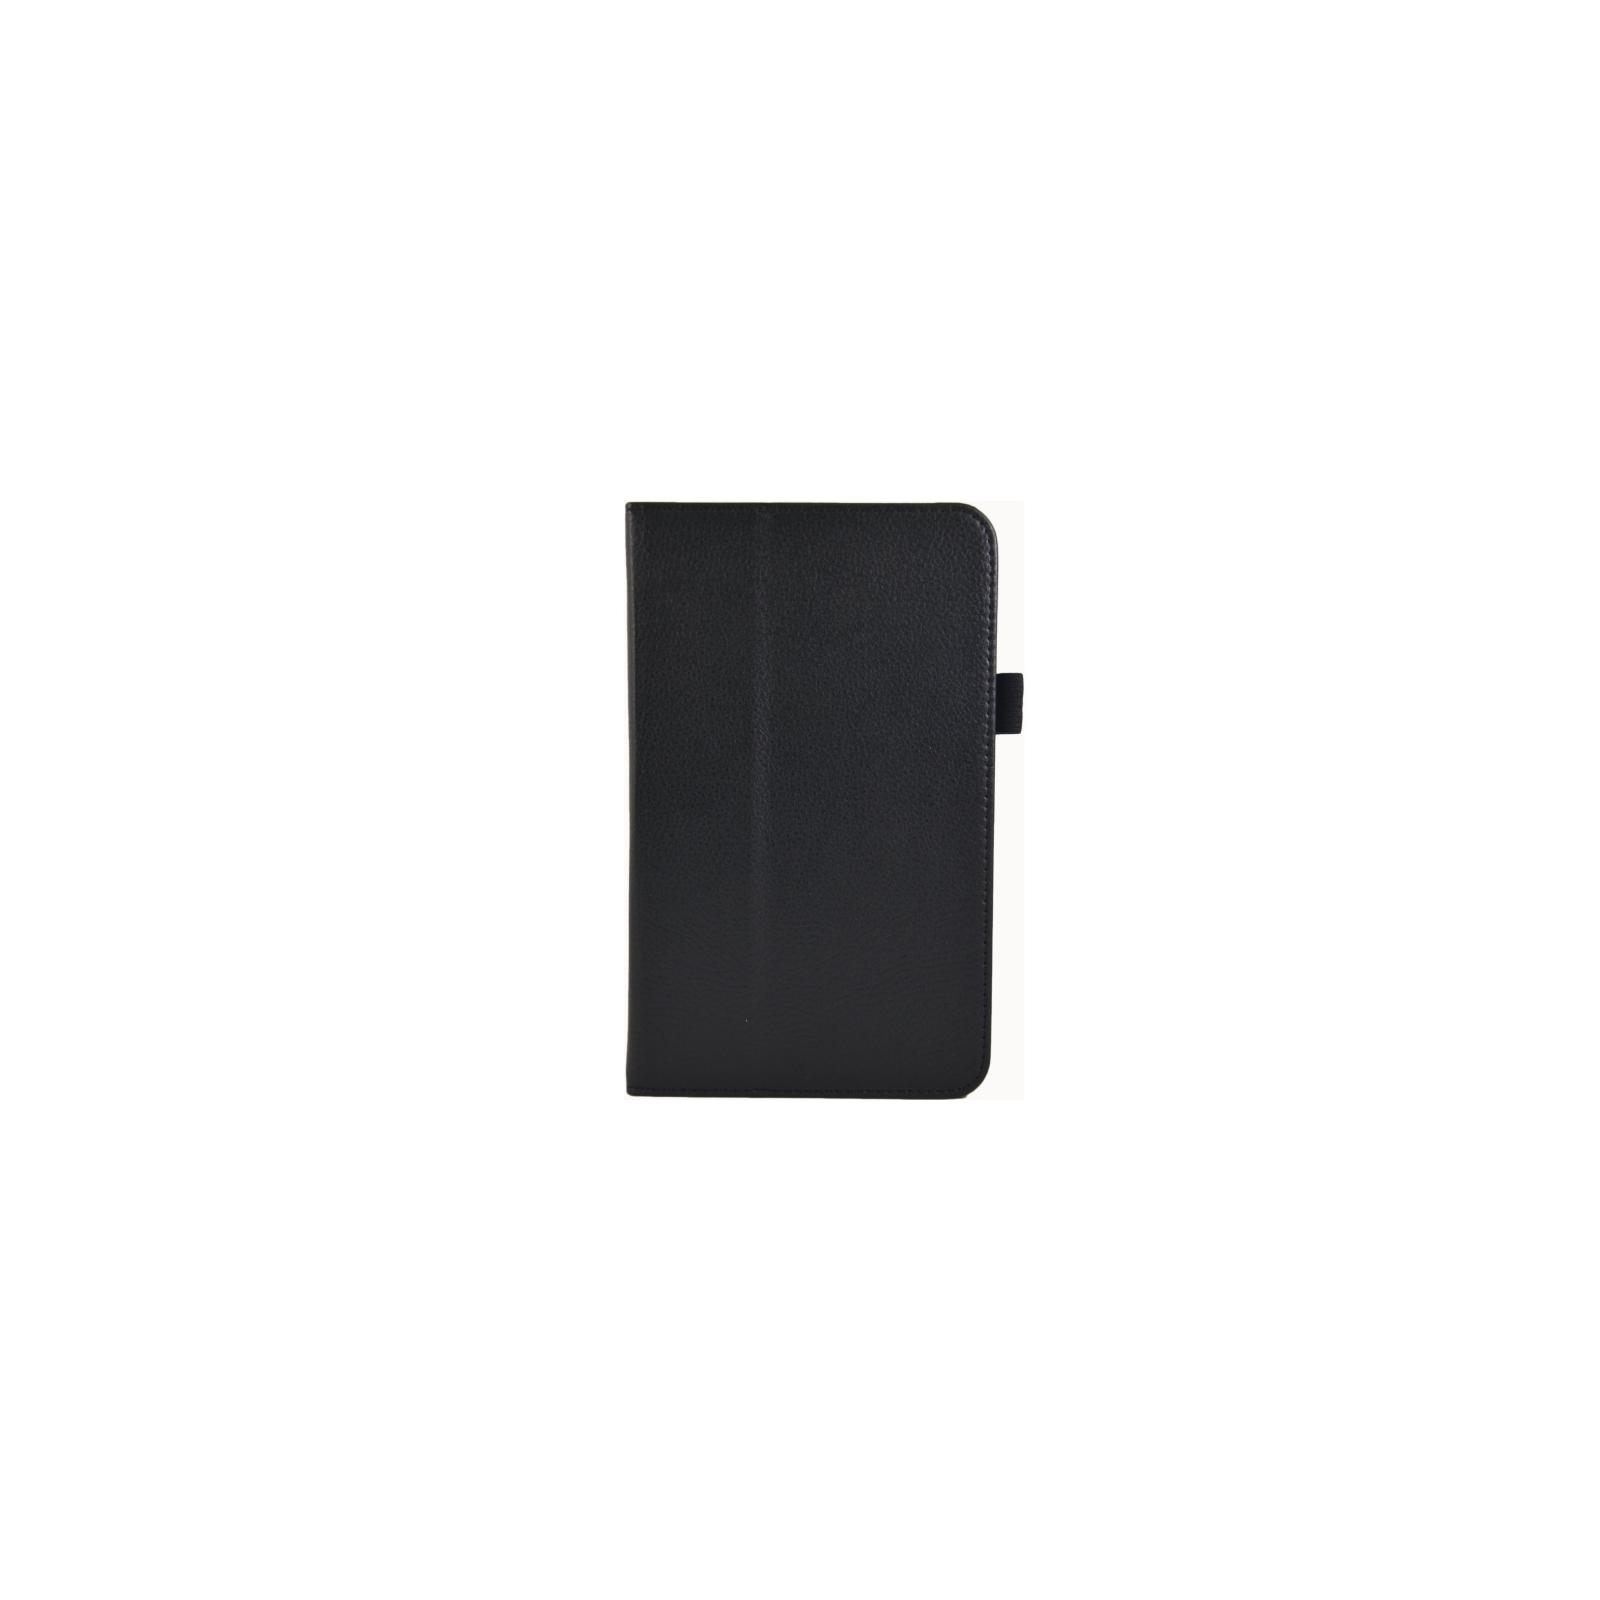 "Чехол для планшета Pro-case Galaxy Tab 3 T2100 7"" (Tab 3 T2100 7"")"